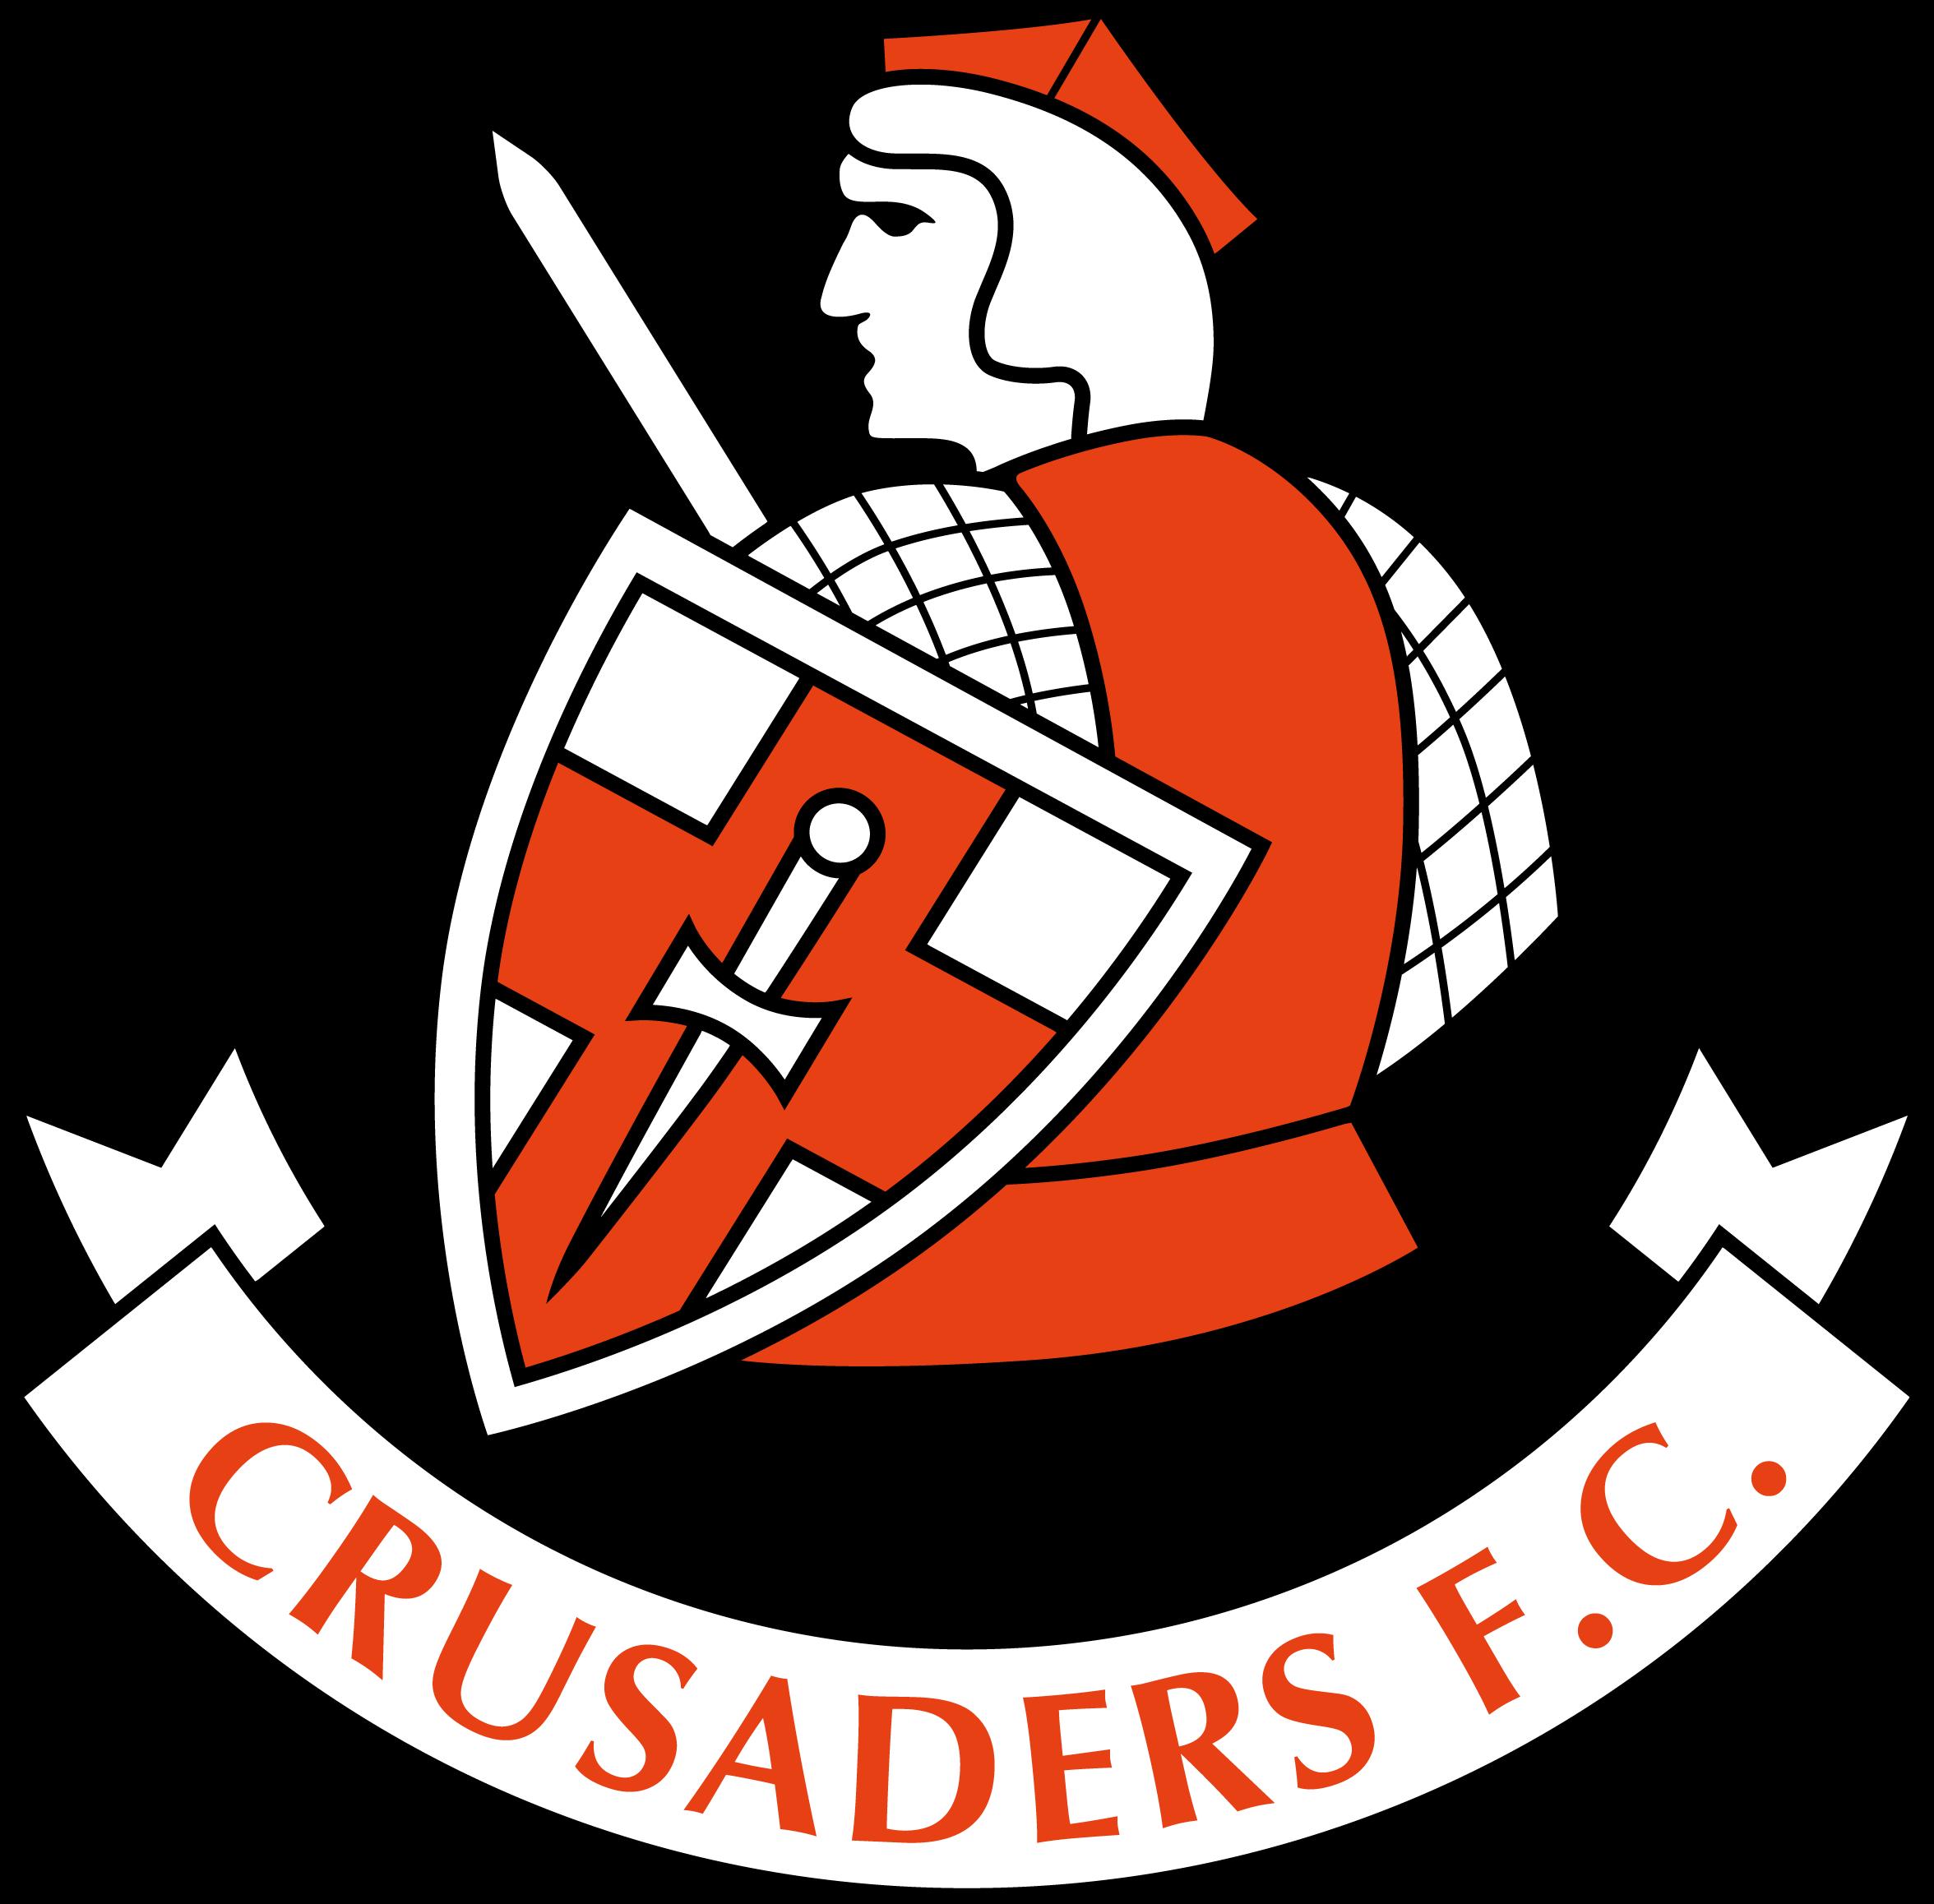 Lion & bat shield kingdom baseball clipart png transparent Crusaders FC   soccer logo   Pinterest   Crusaders png transparent